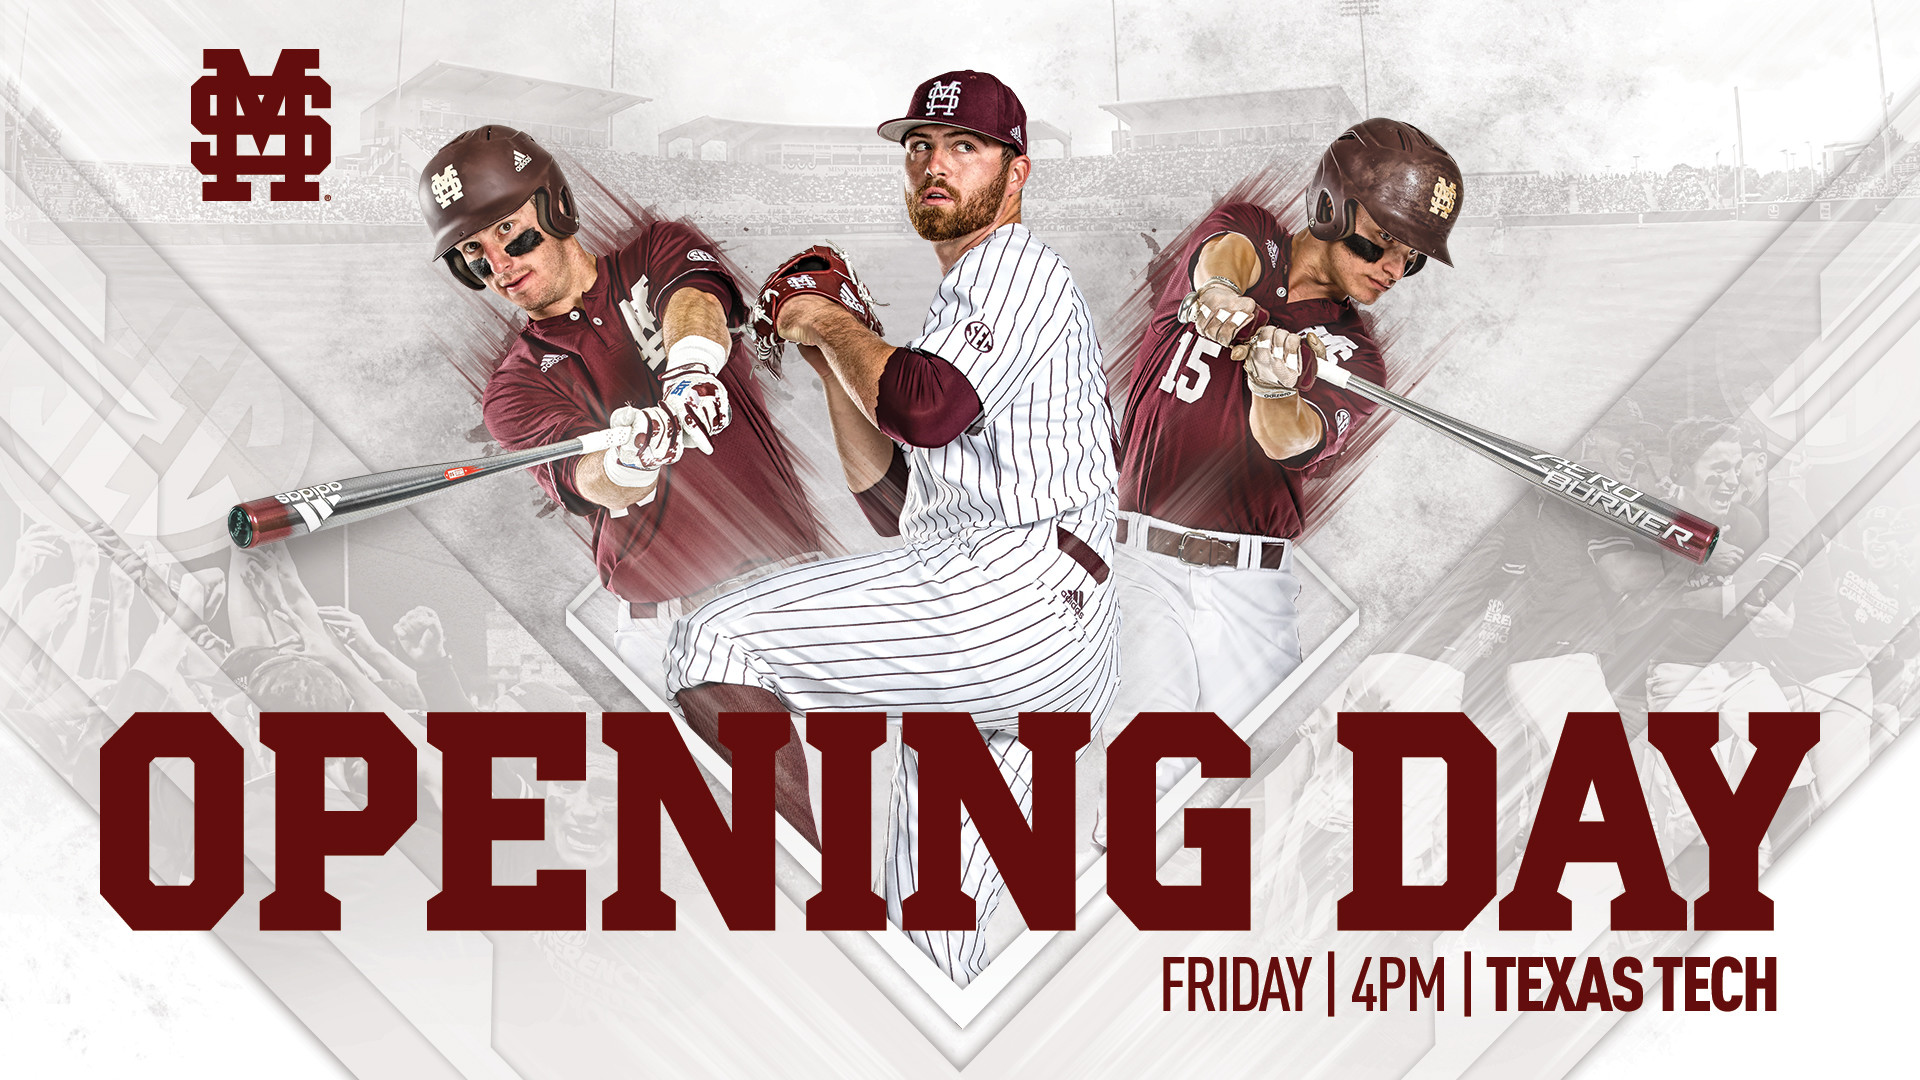 127th Season Of Mississippi State Baseball Begins Friday